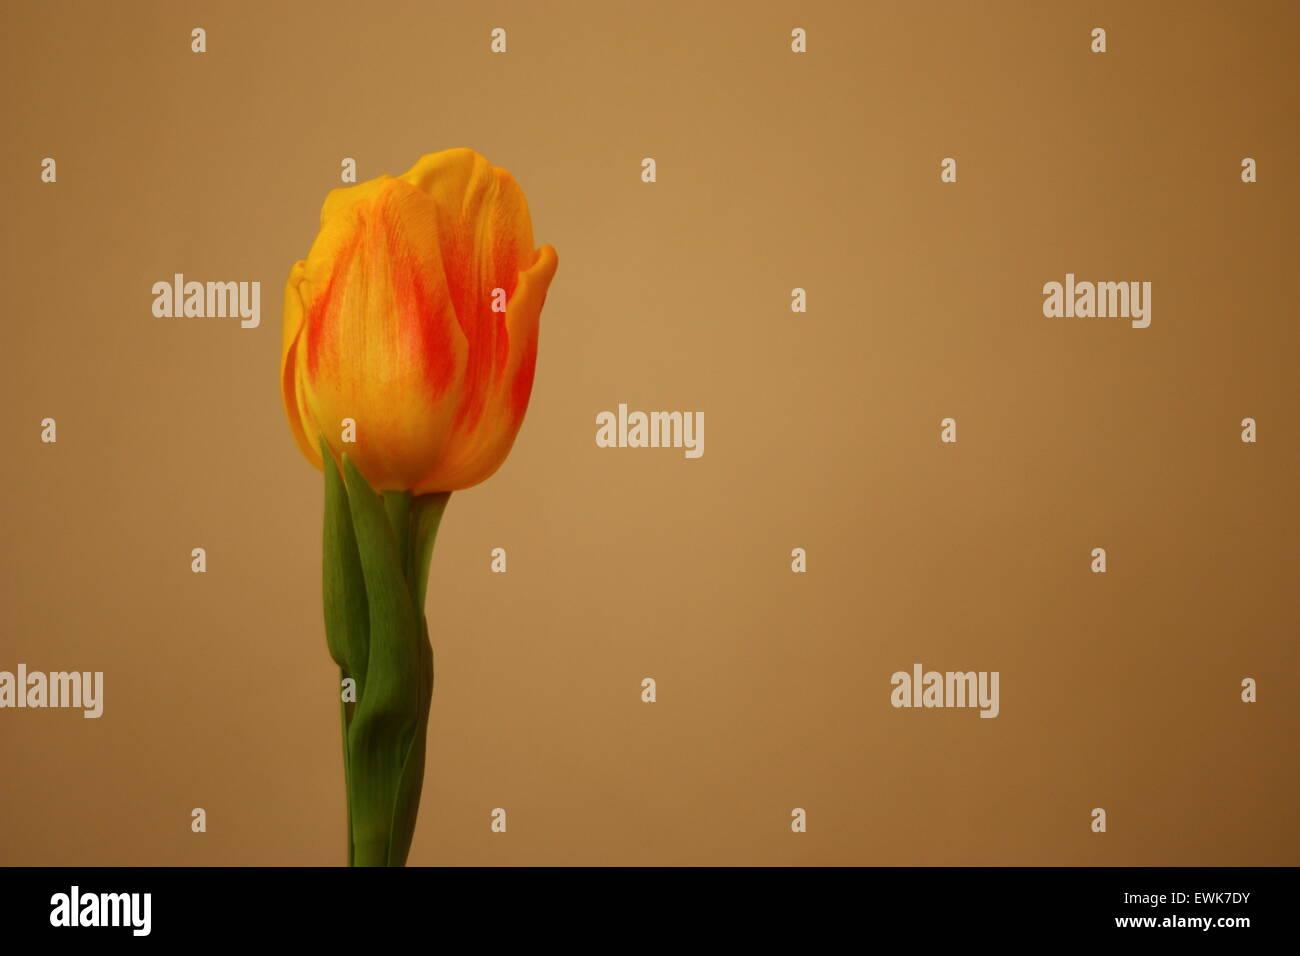 Tulipán amarillo aislados, tulipa, Liliaceae. Foto de stock